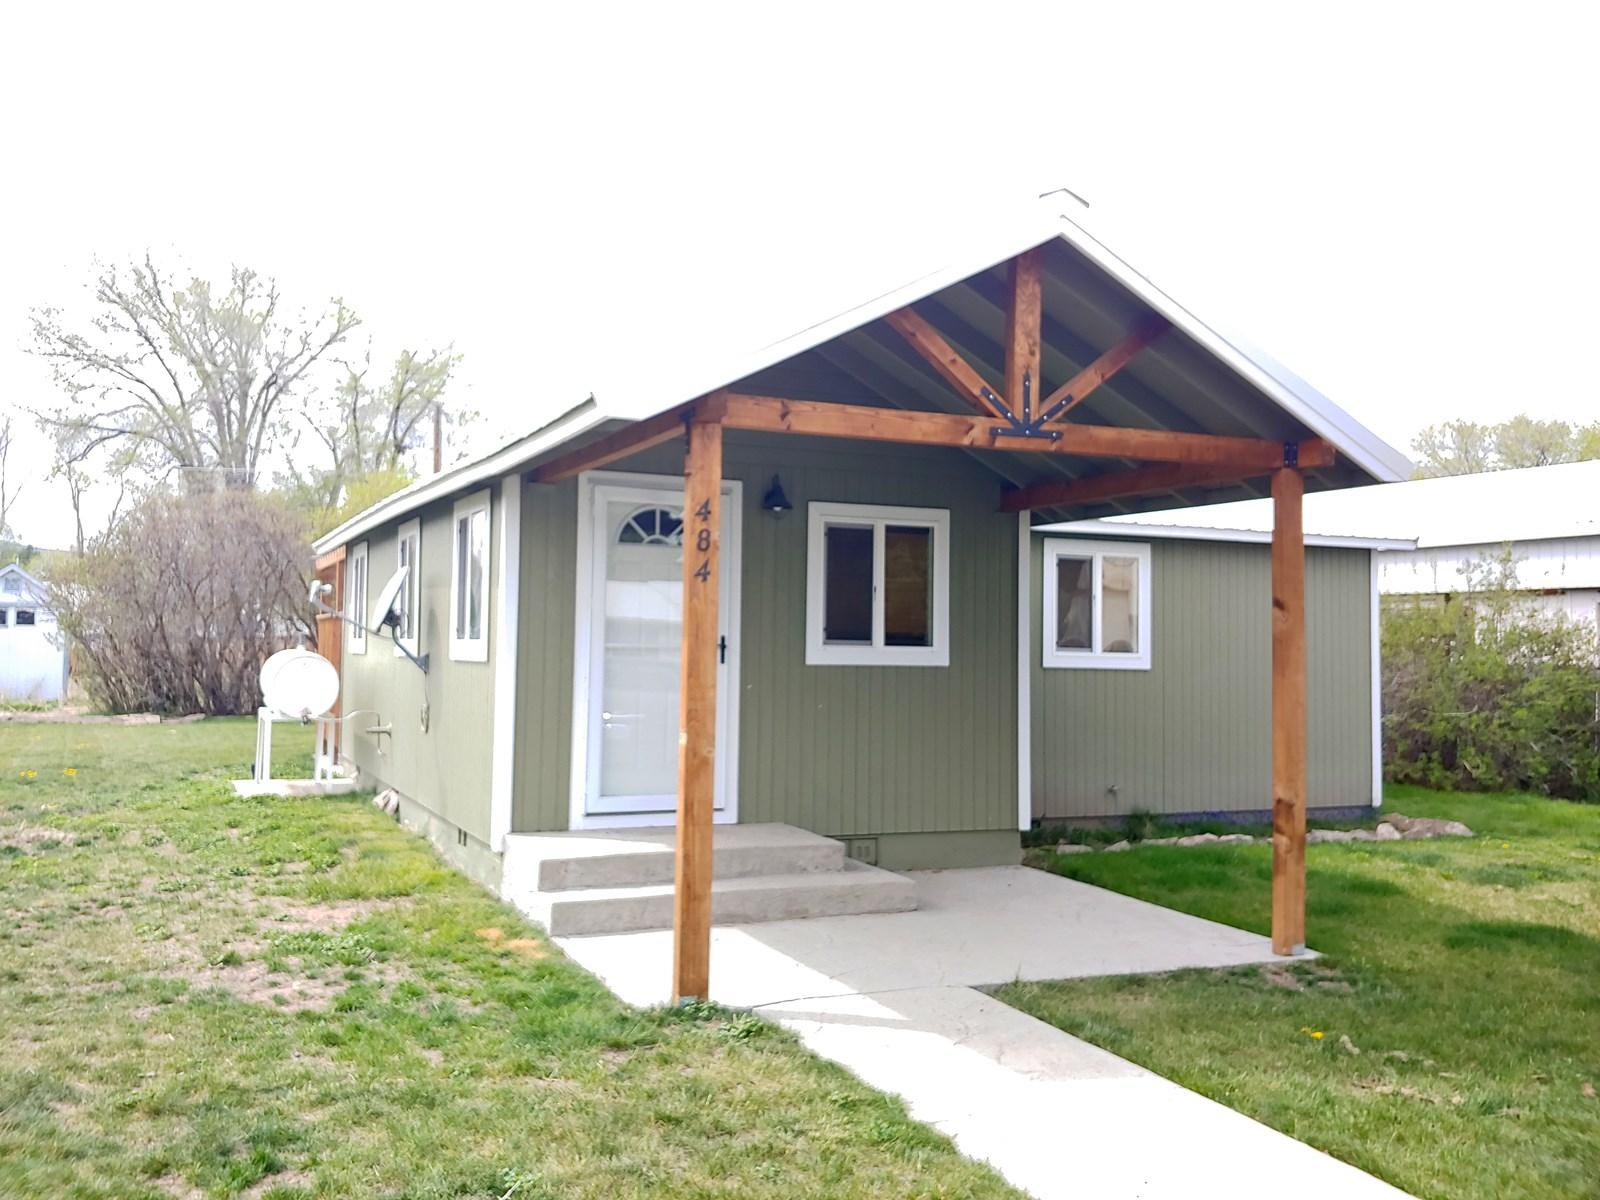 Quaint 2 Bedroom Home on Fairview Ave in Burns, Oregon